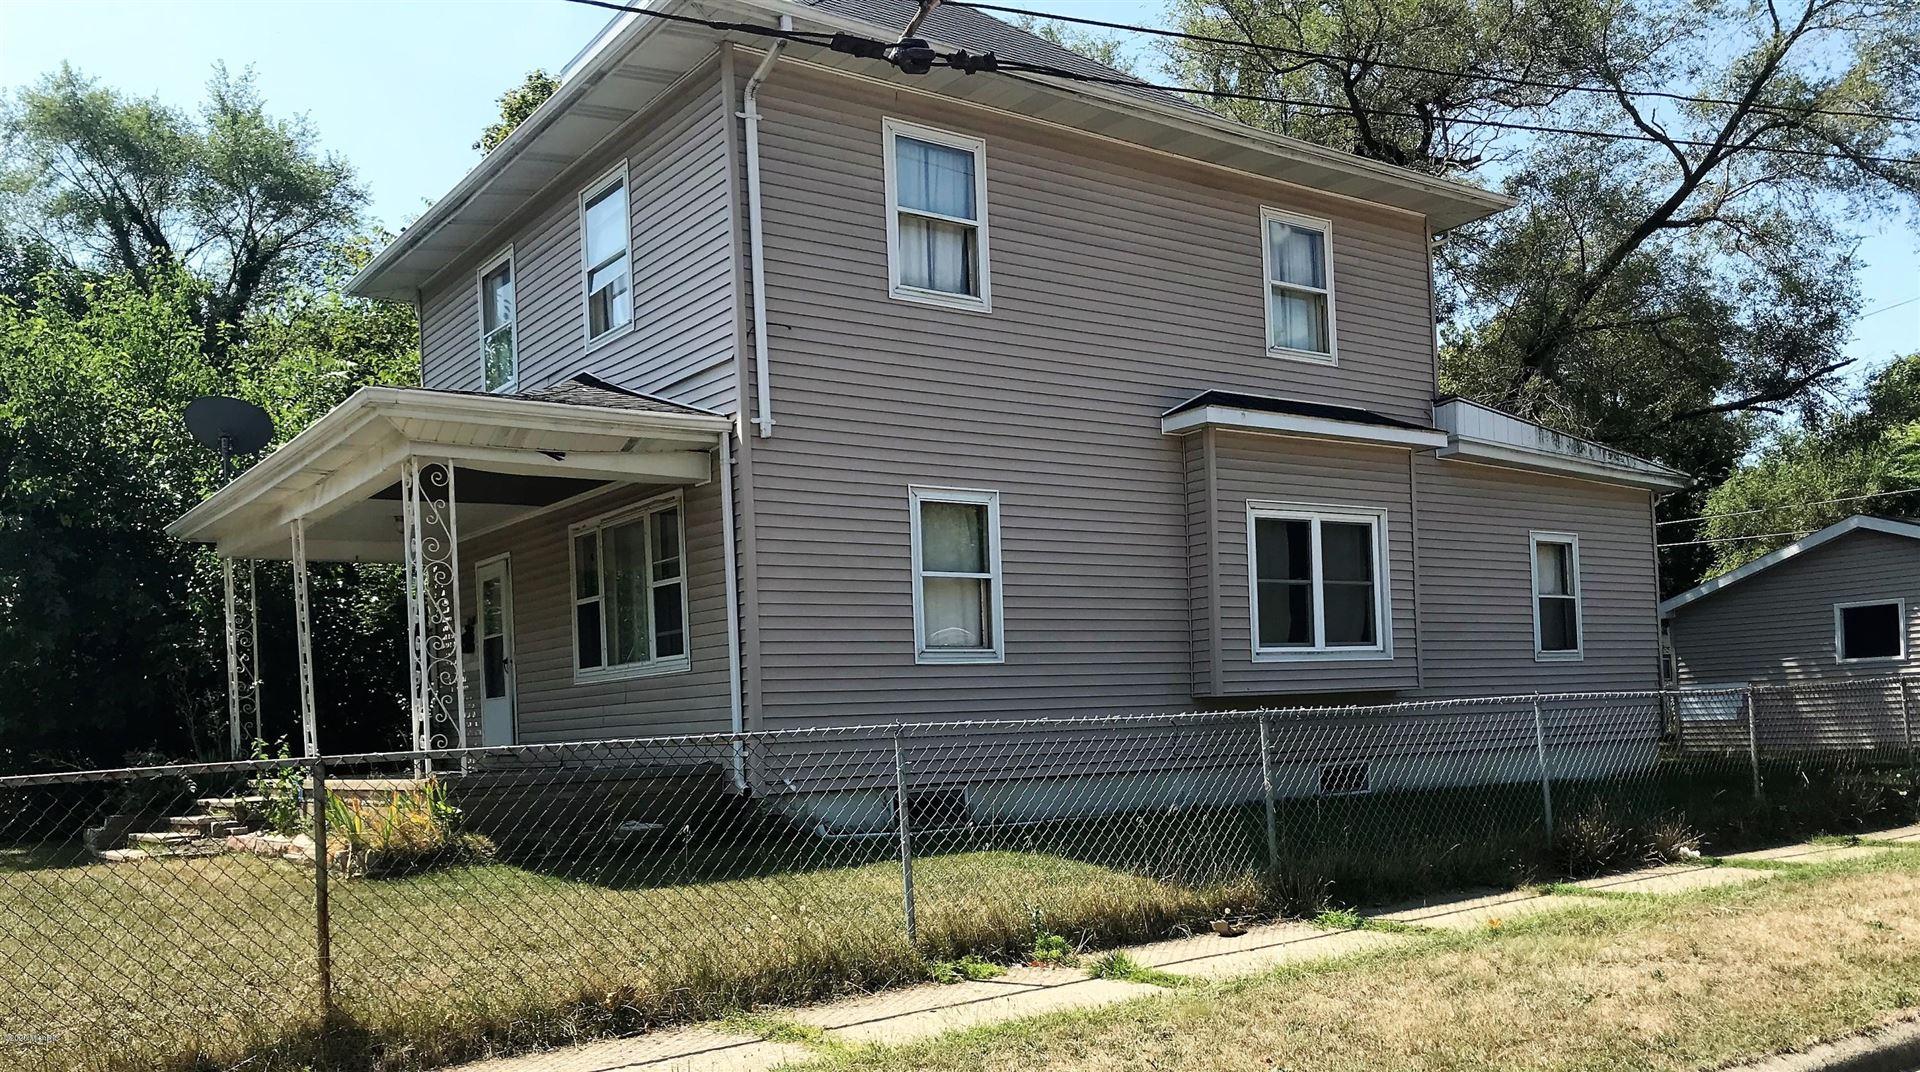 1008 Superior Street, Benton Harbor, MI 49022 - MLS#: 20035869